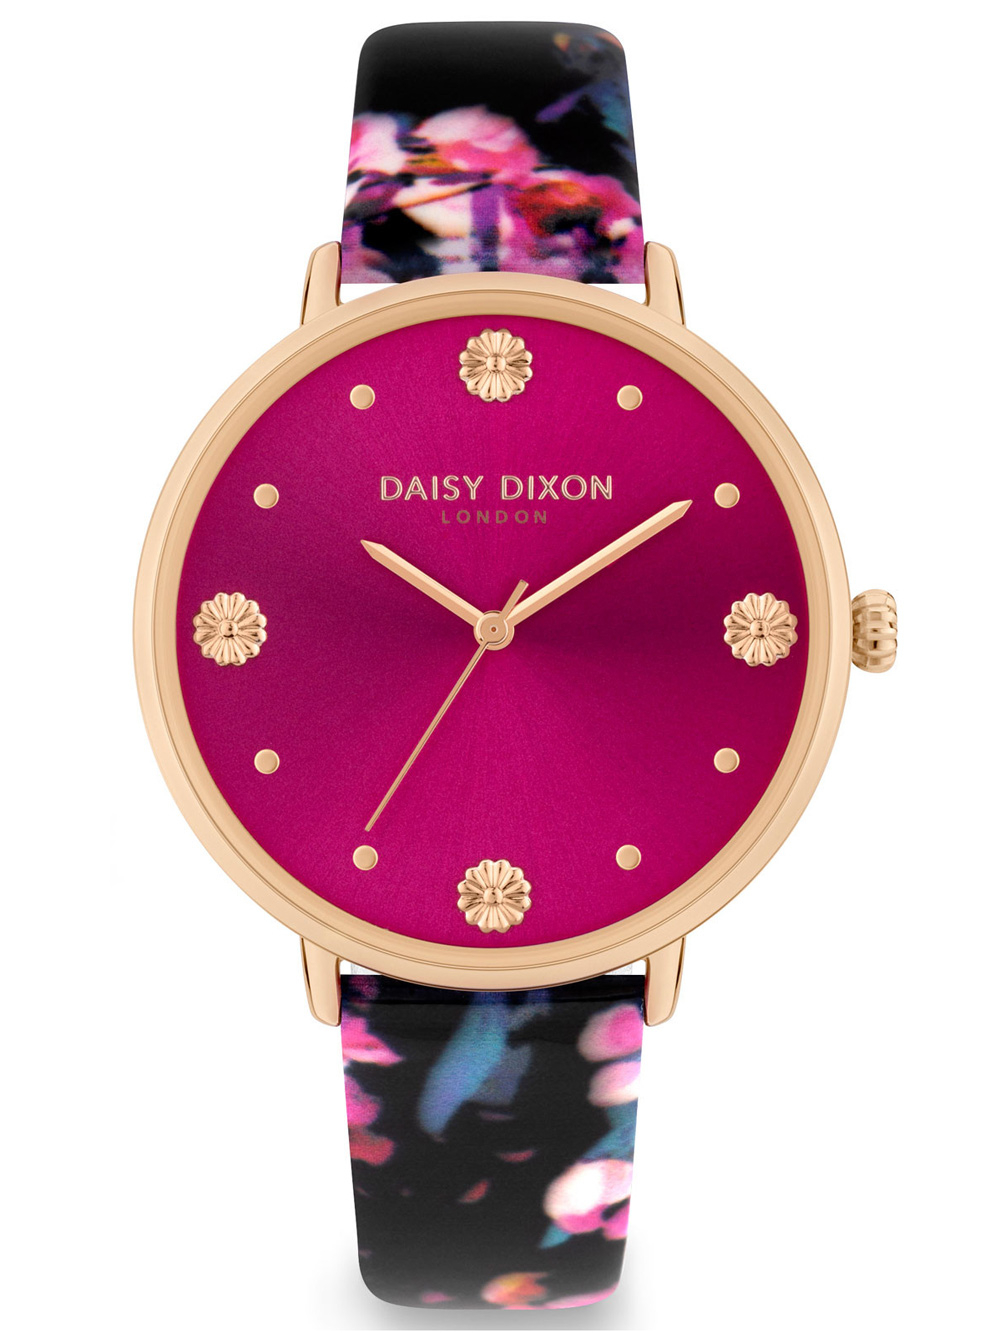 Daisy Dixon DD116BP Kendall mit Clutch Damen 38mm 3ATM | Taschen > Handtaschen > Clutches | Daisy Dixon